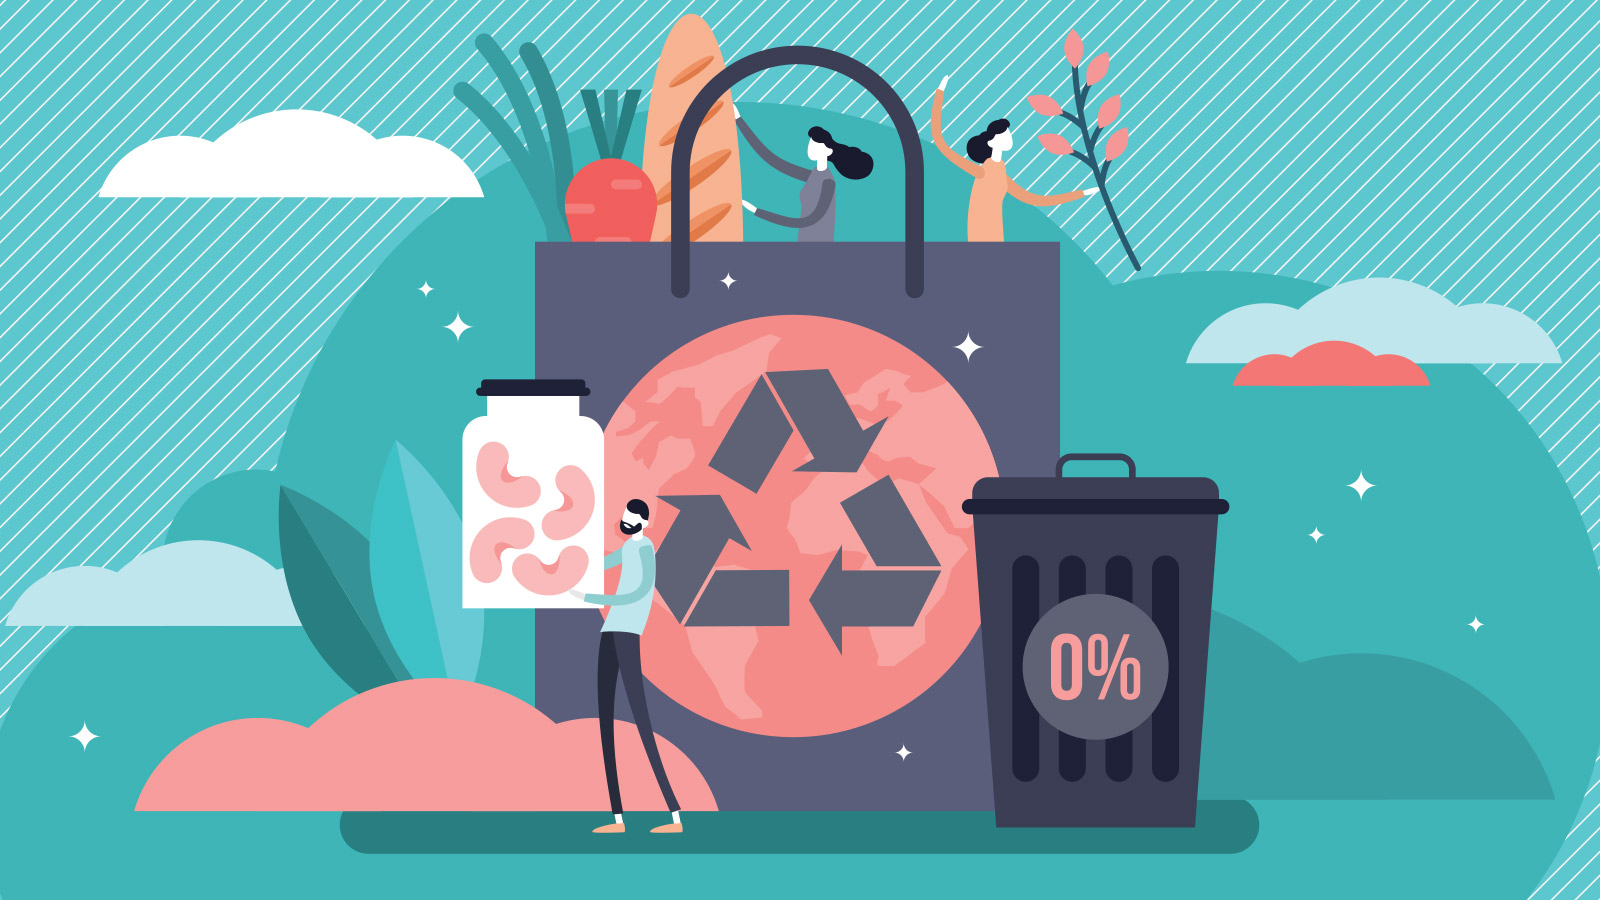 Zero waste vector illustration